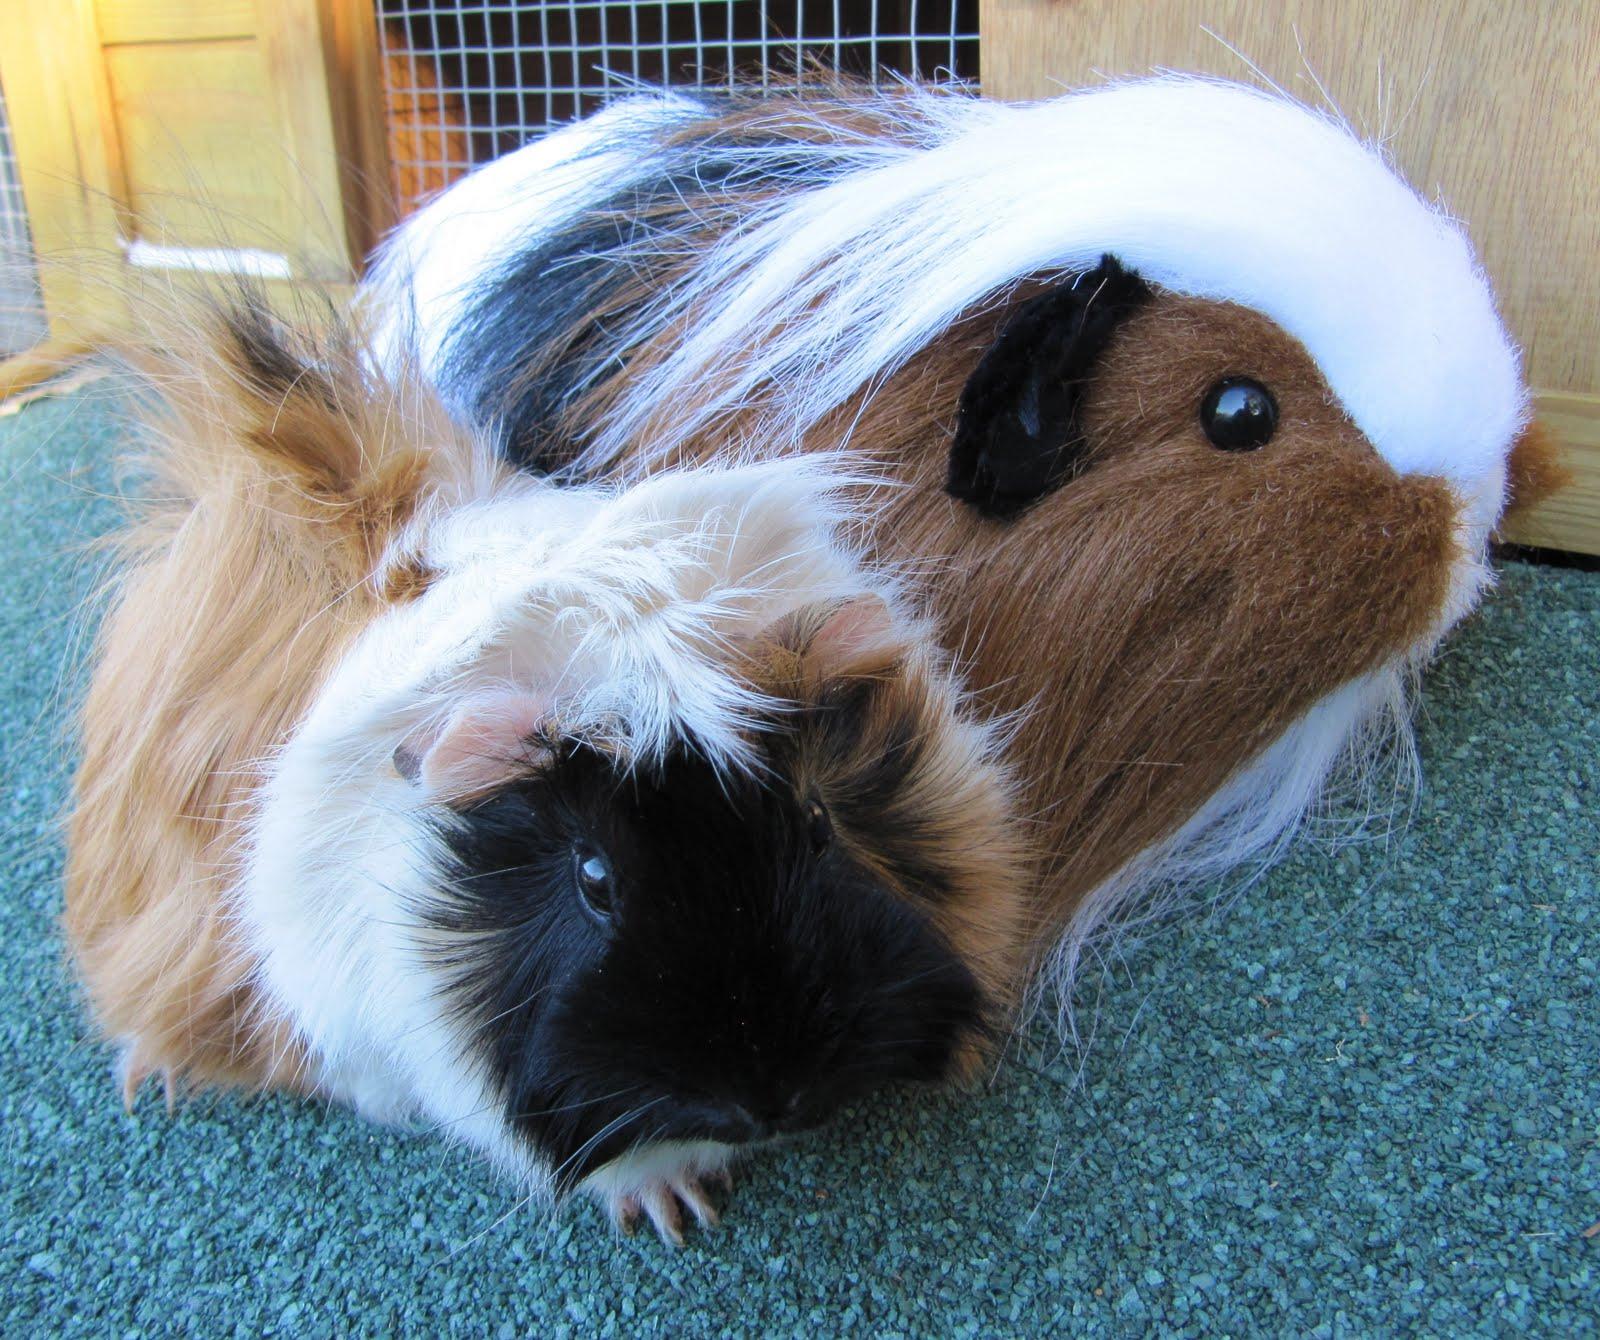 All Things Guinea Pig: Plush Piggies